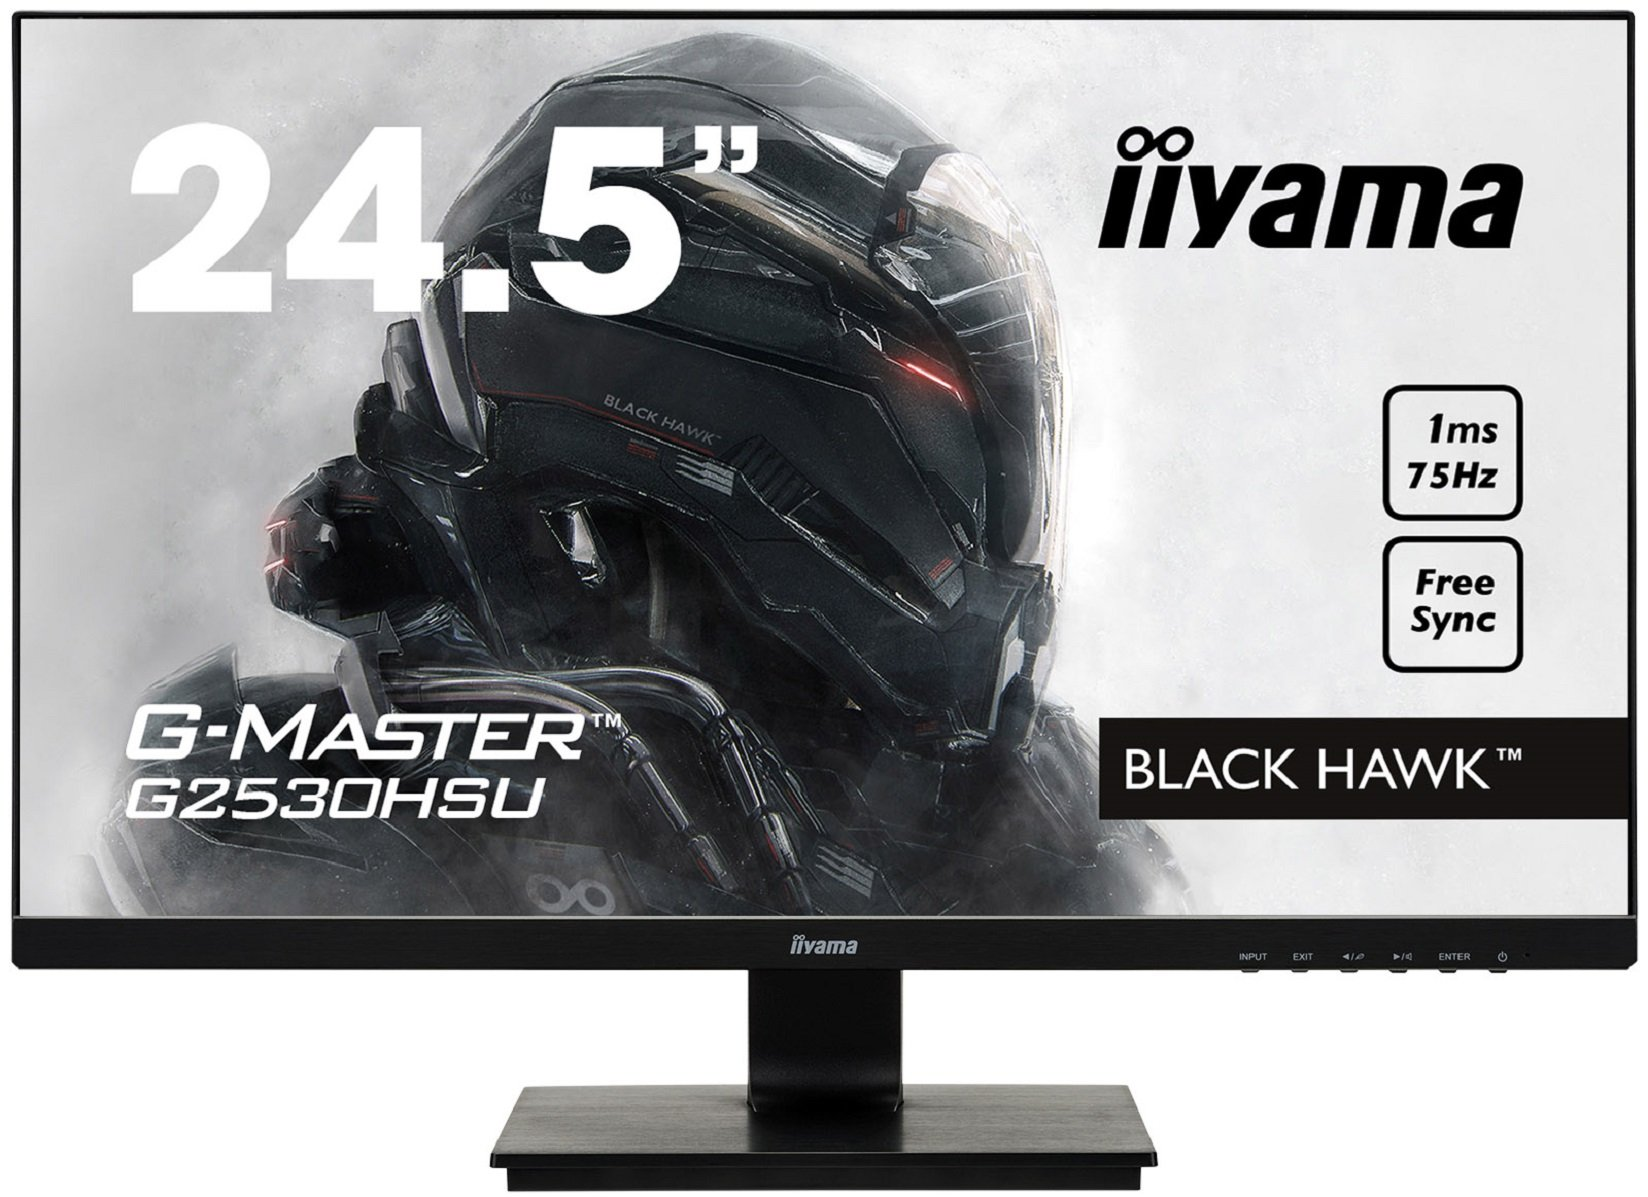 "IIYAMA Black Hawk Moniteur Grand Public 24,5"" (62,2 cm) HDMI 1920 x 1080 Noir product image"